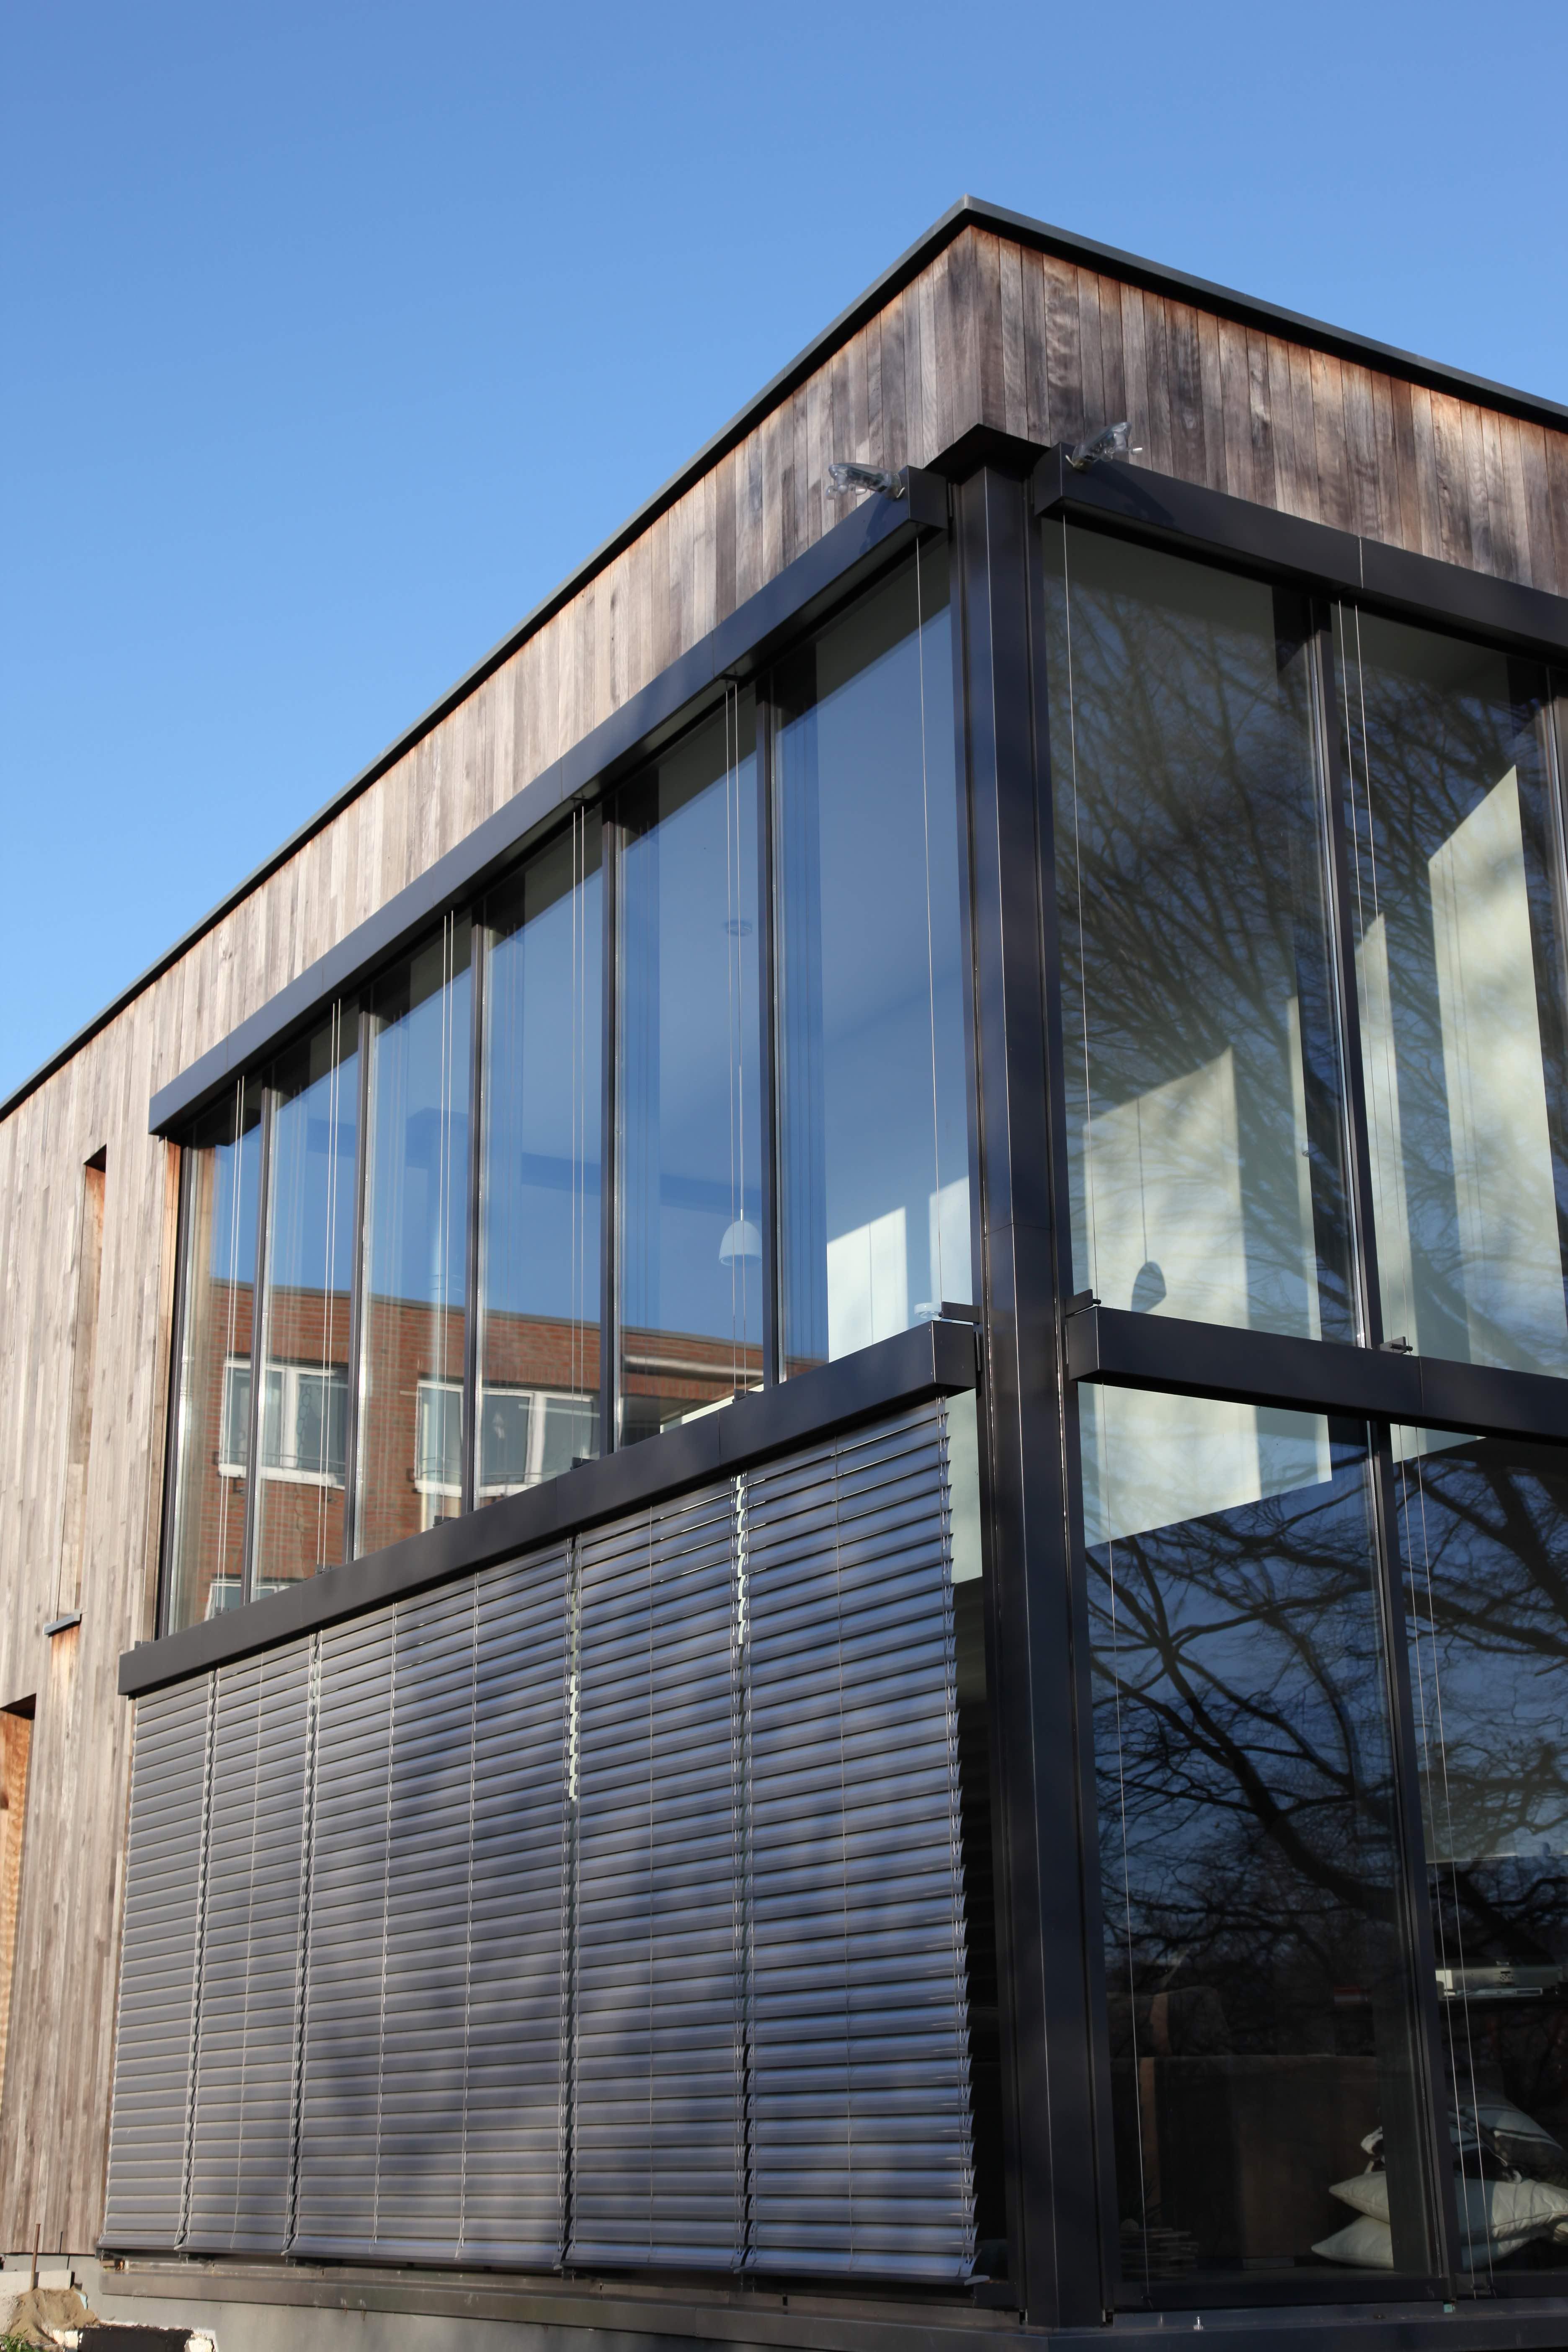 http://architektur-anders.de/wp-content/uploads/2018/06/IMG_2363.jpg